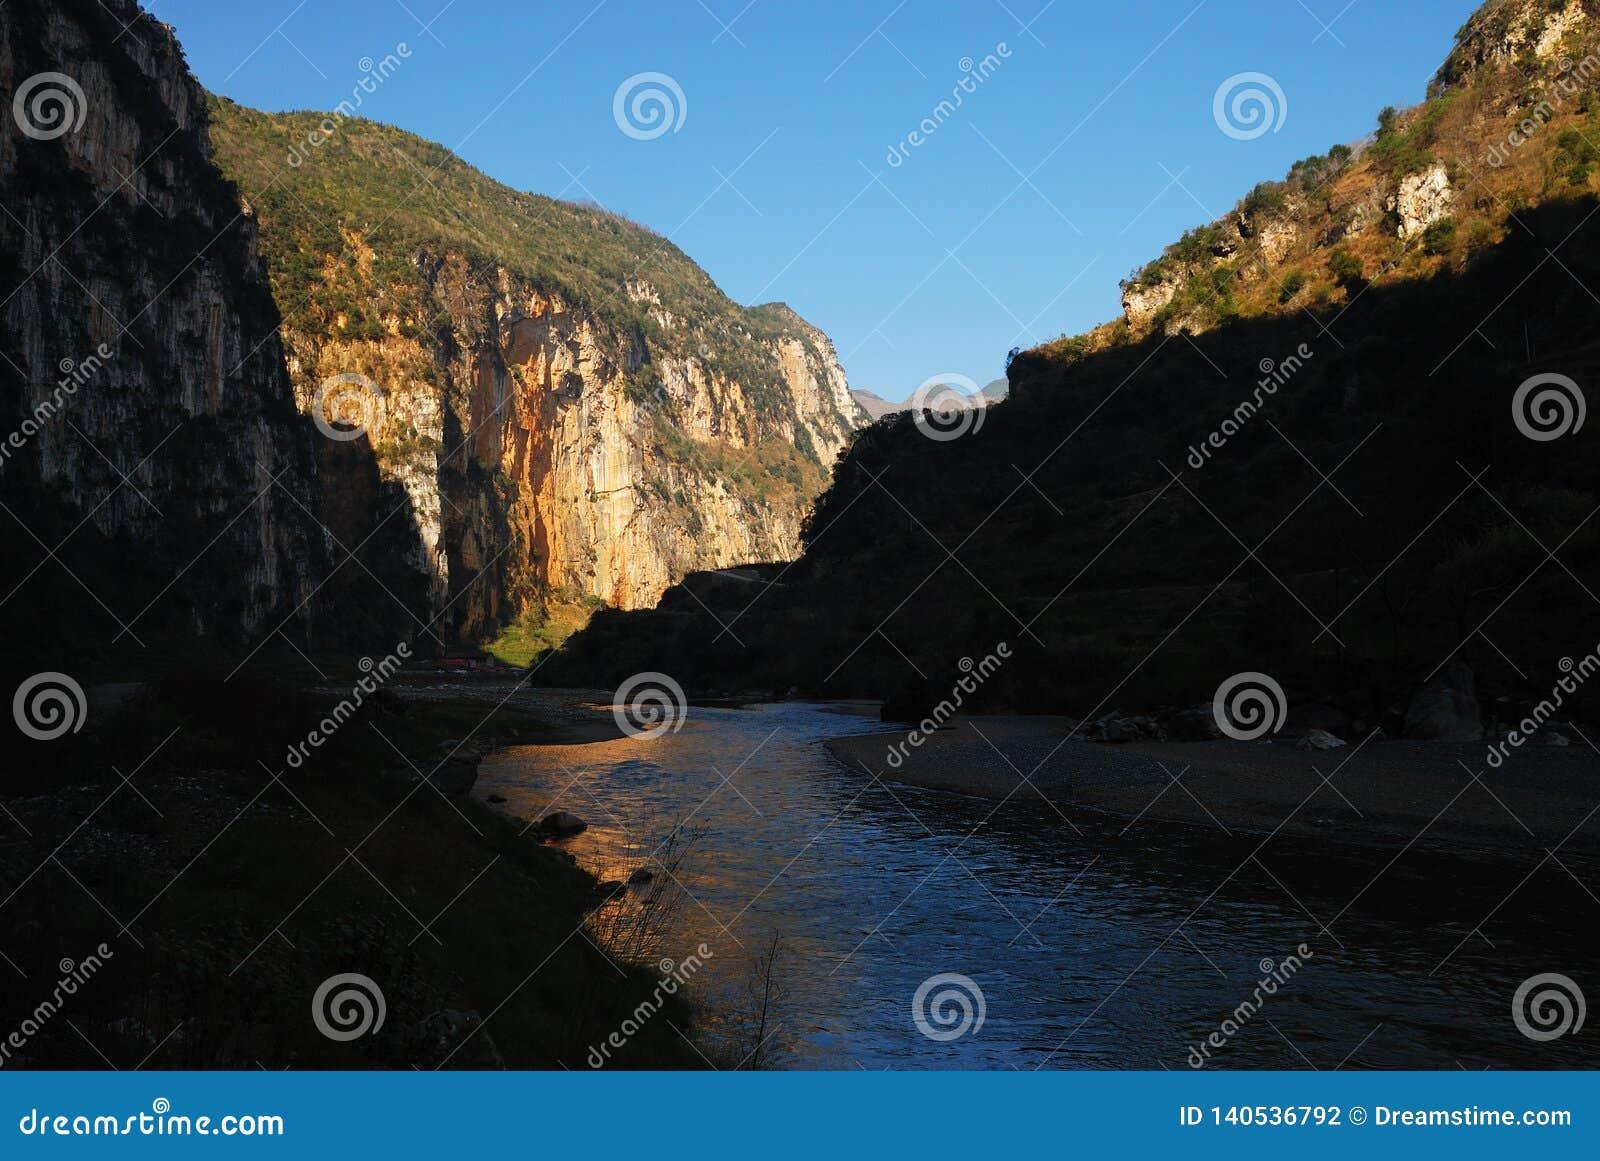 Grand Canyon e fiume curvato di mattina leggeri, Guizhou, porcellana, è µå·ž, ˜æ° del› del ç del å…, ½ del› del ä¸å